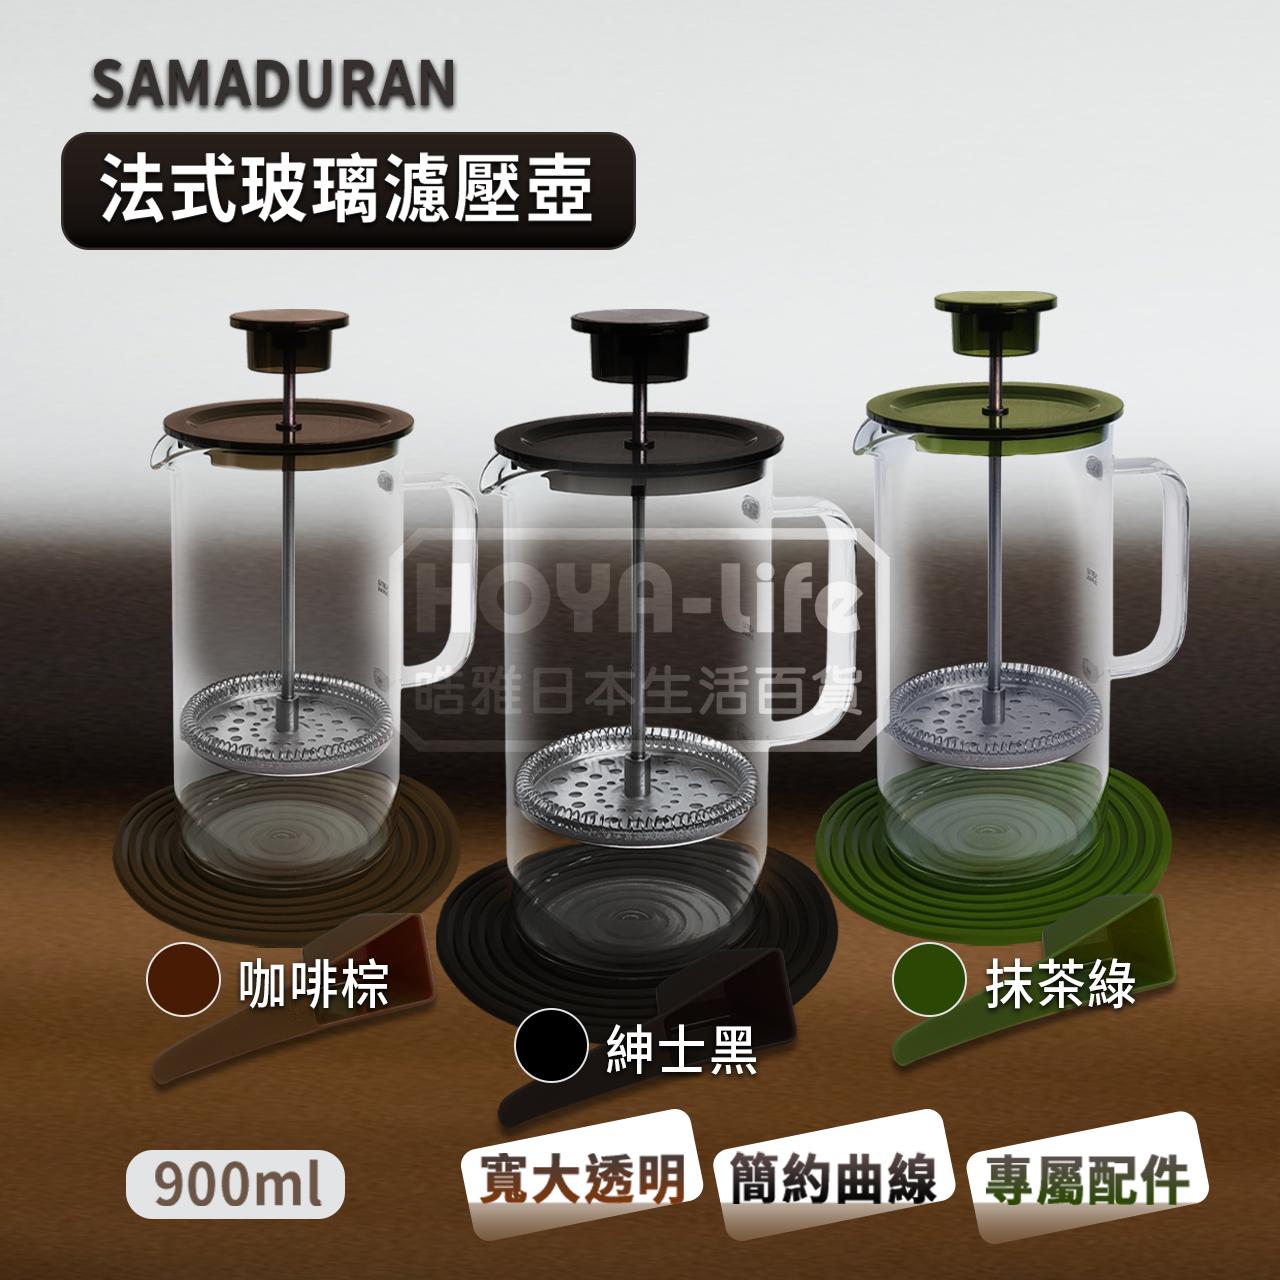 《HOYA-Life日本生活館》 法式 samaDURAN咖啡濾壓壺 泡茶壺 咖啡壺 花茶 茶葉 沖泡